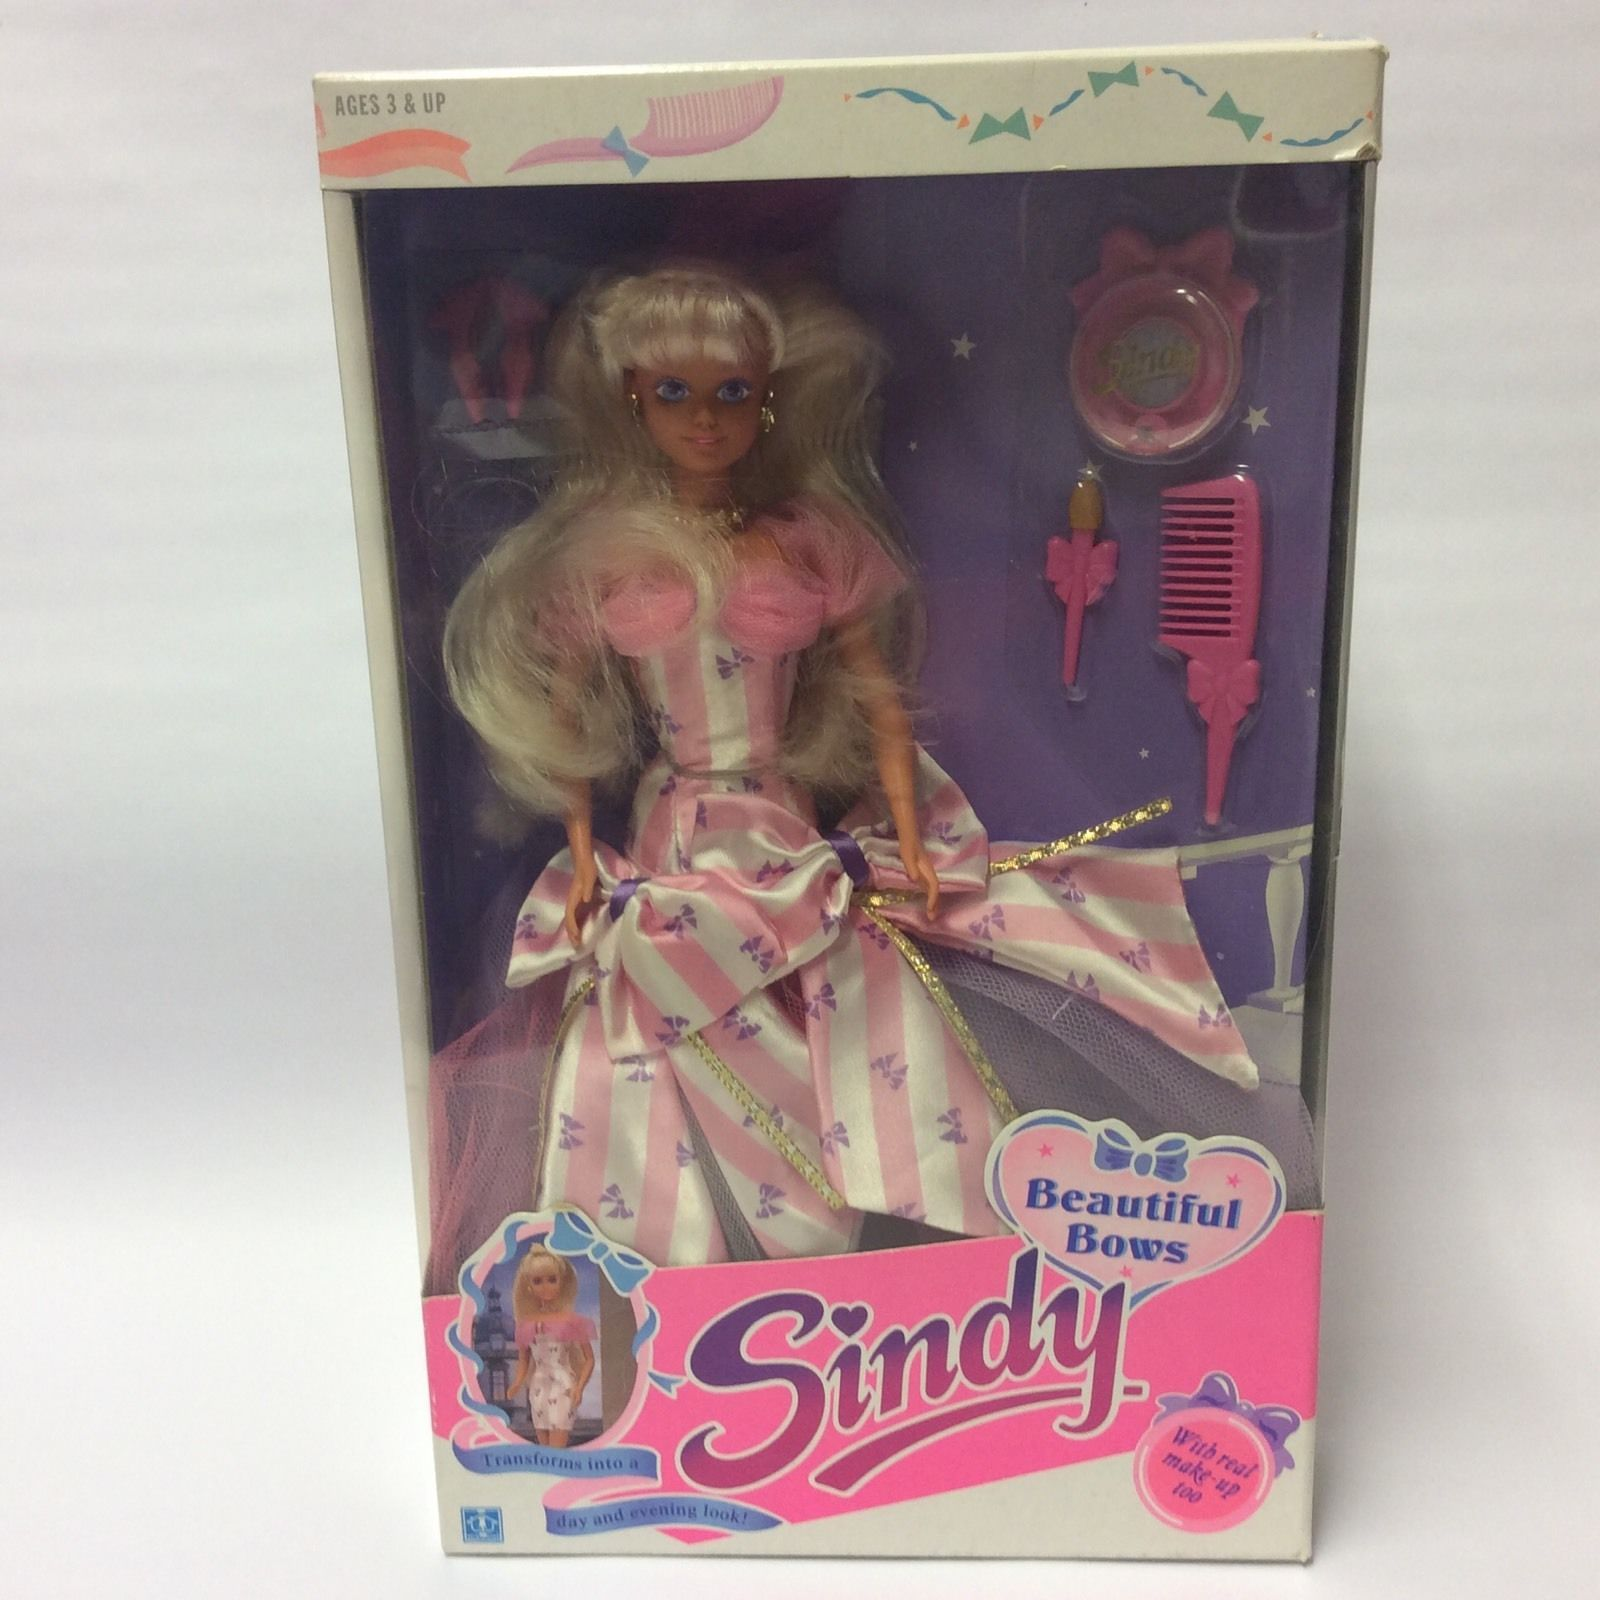 Vintage Hasbro 1990s Sindy Doll - Pop Star Yellow Hair